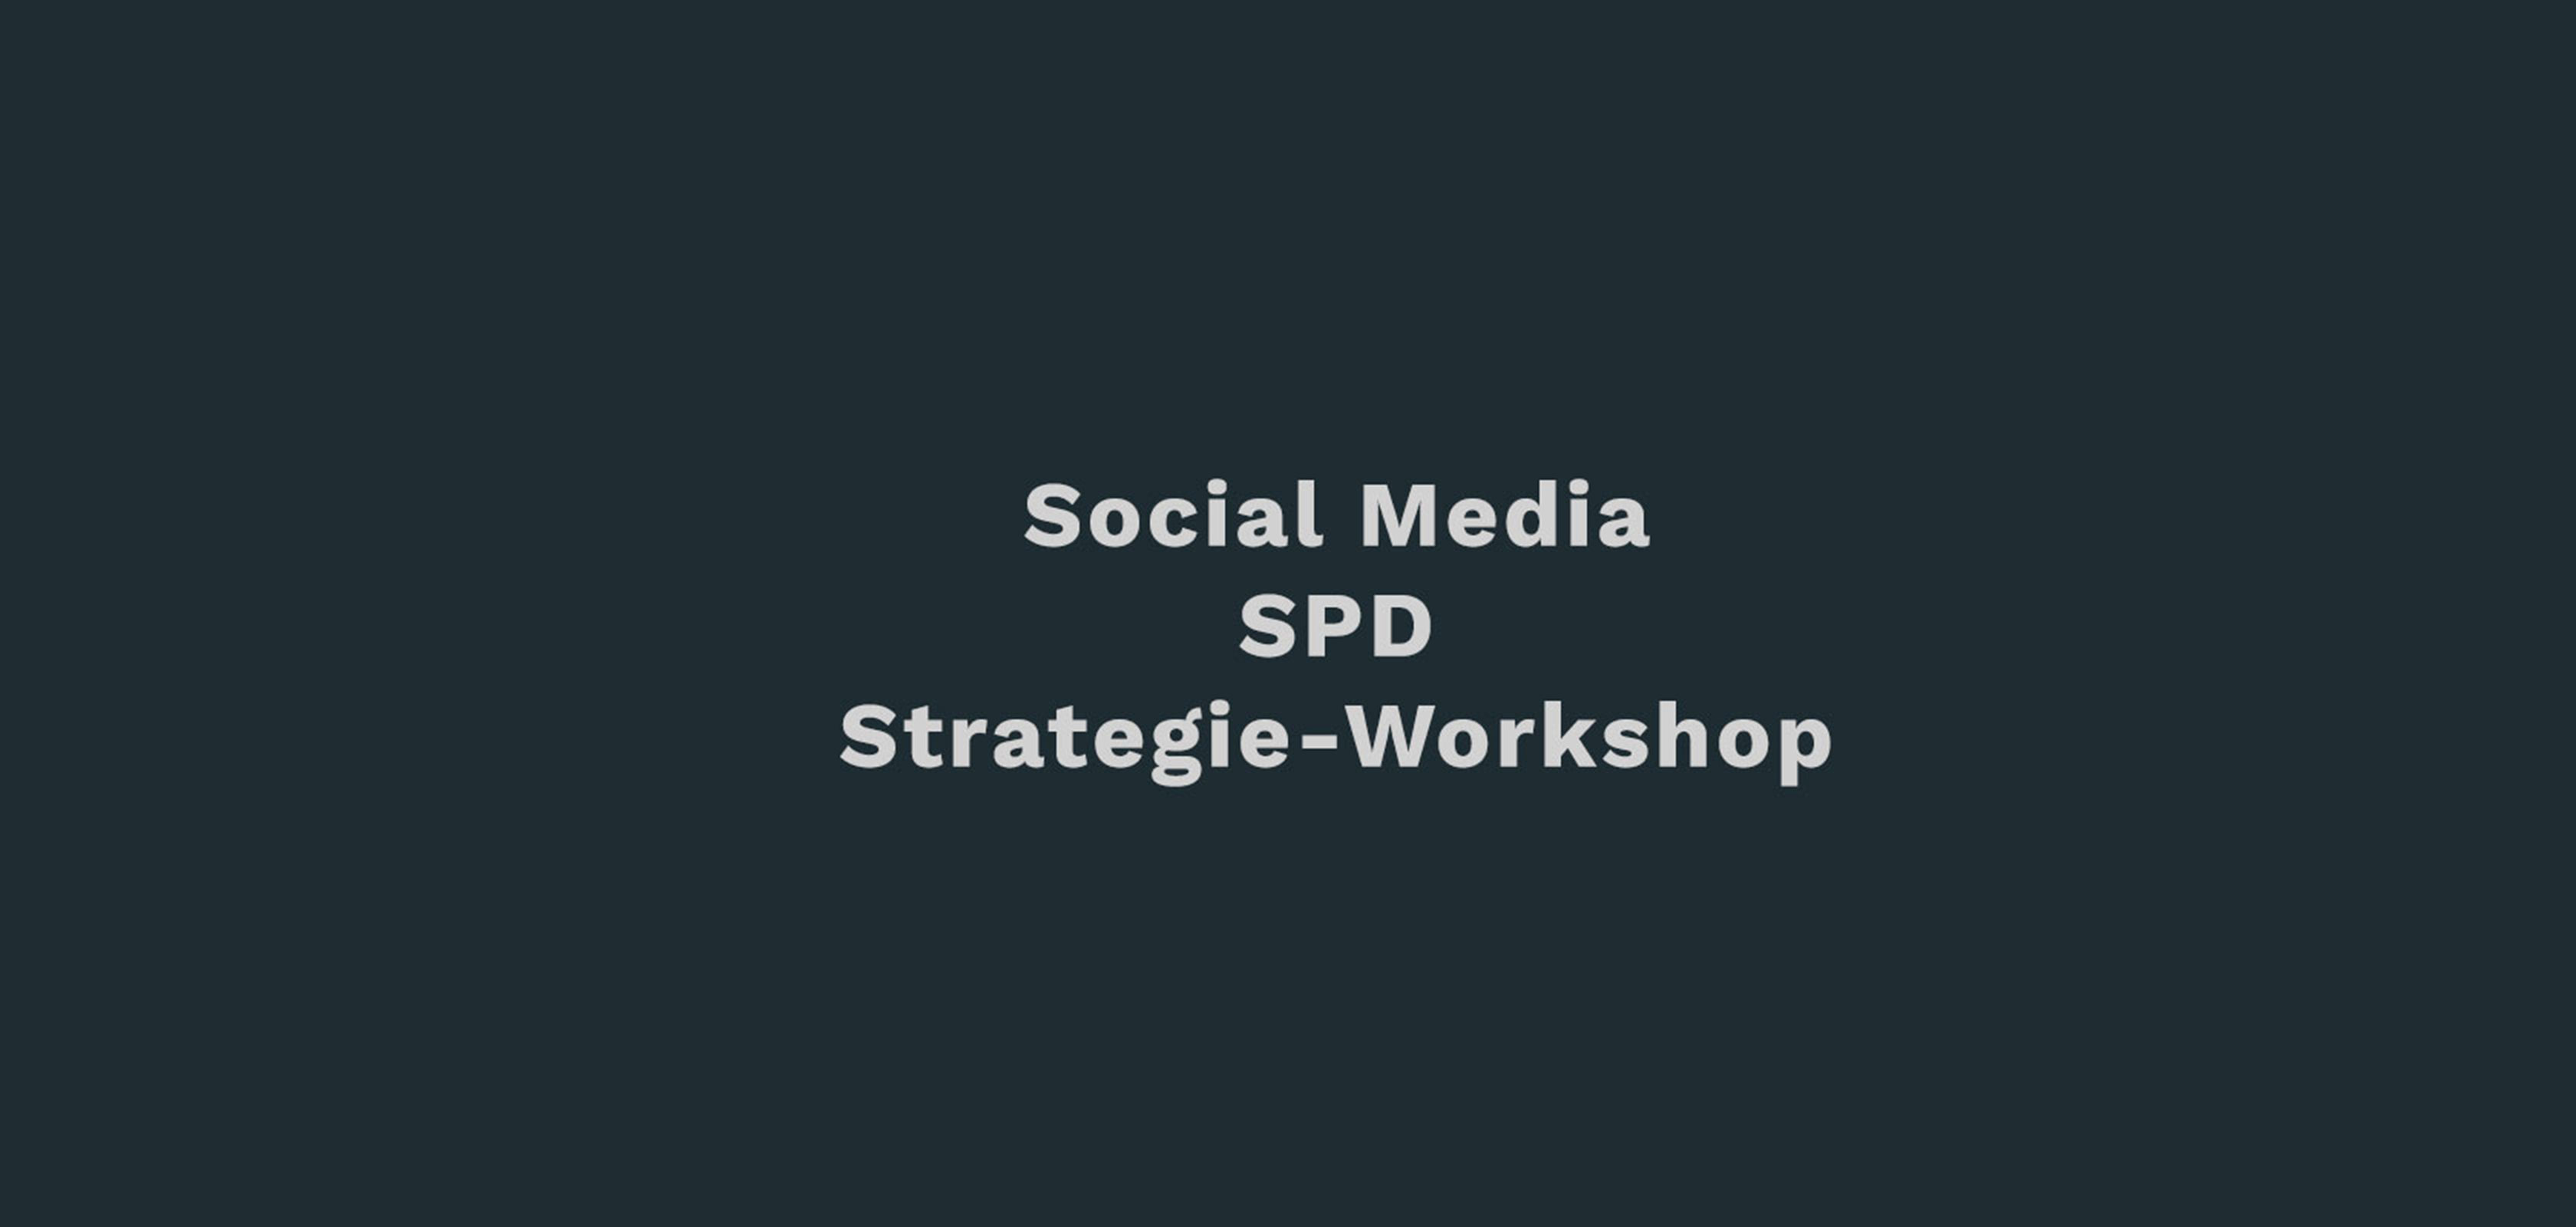 SPD-Strategie-Workshop-DZP-Social-Media